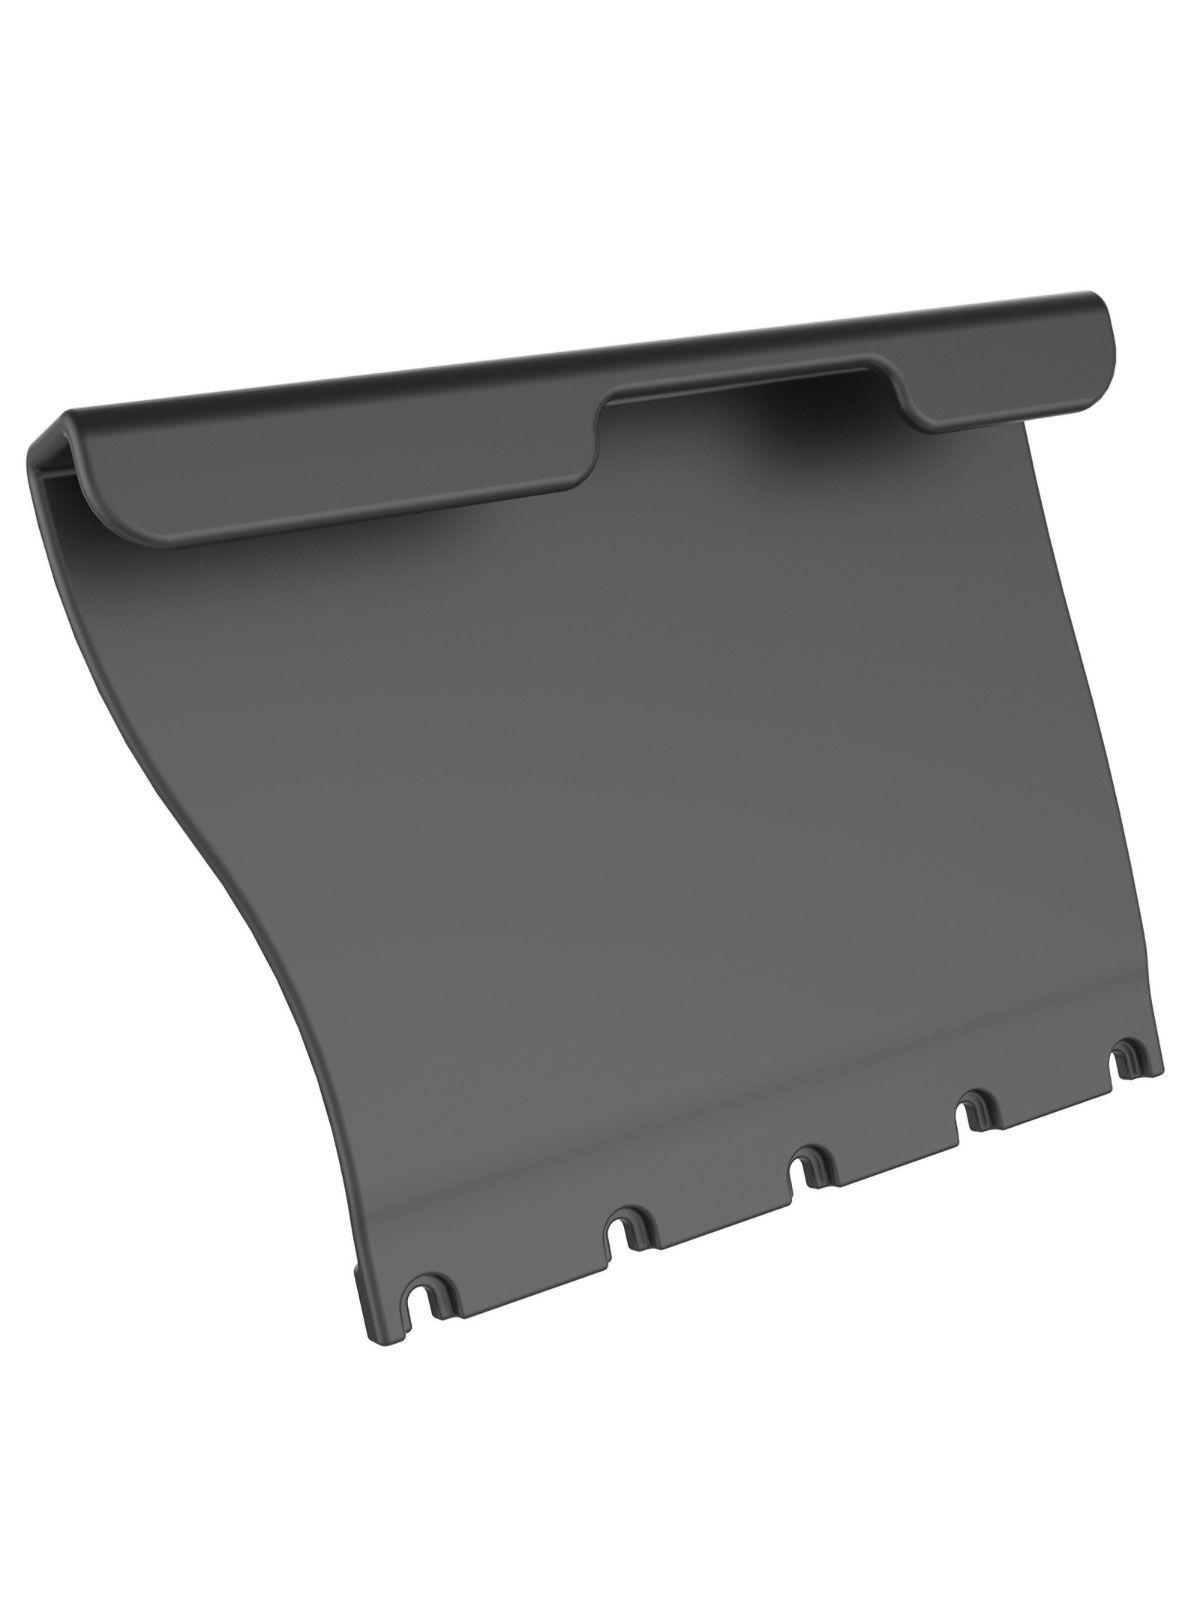 RAM Mounts Endkappe (oben) für GDS Dockingstation Apple iPad Pro 11